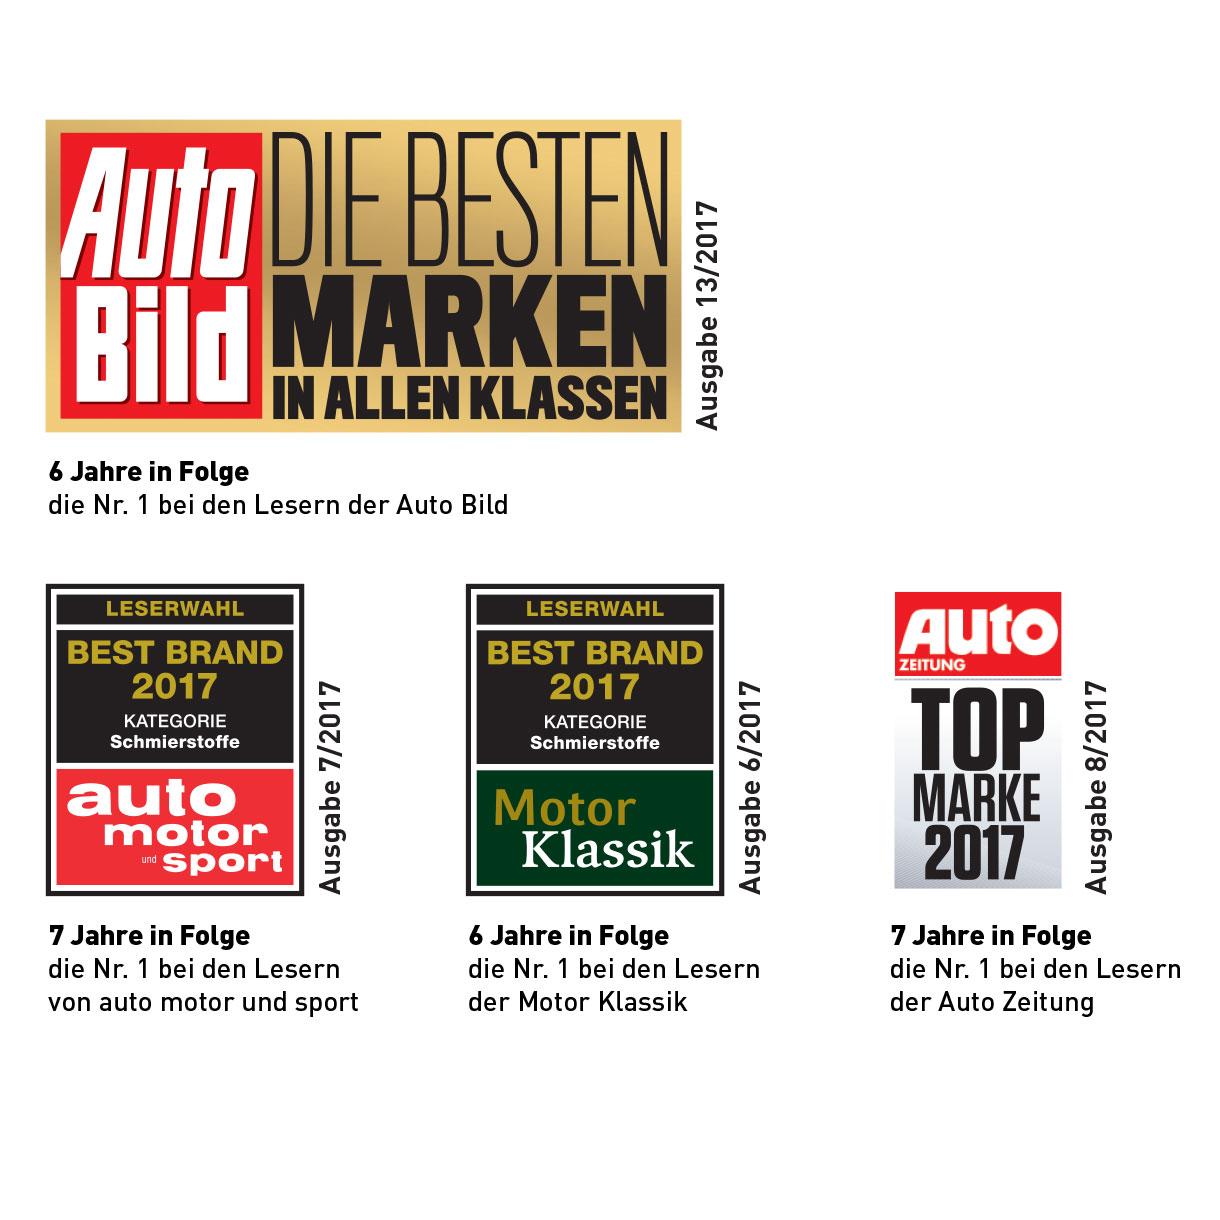 LIQUI MOLY remains Germany\'s most popular oil brand: LIQUI MOLY